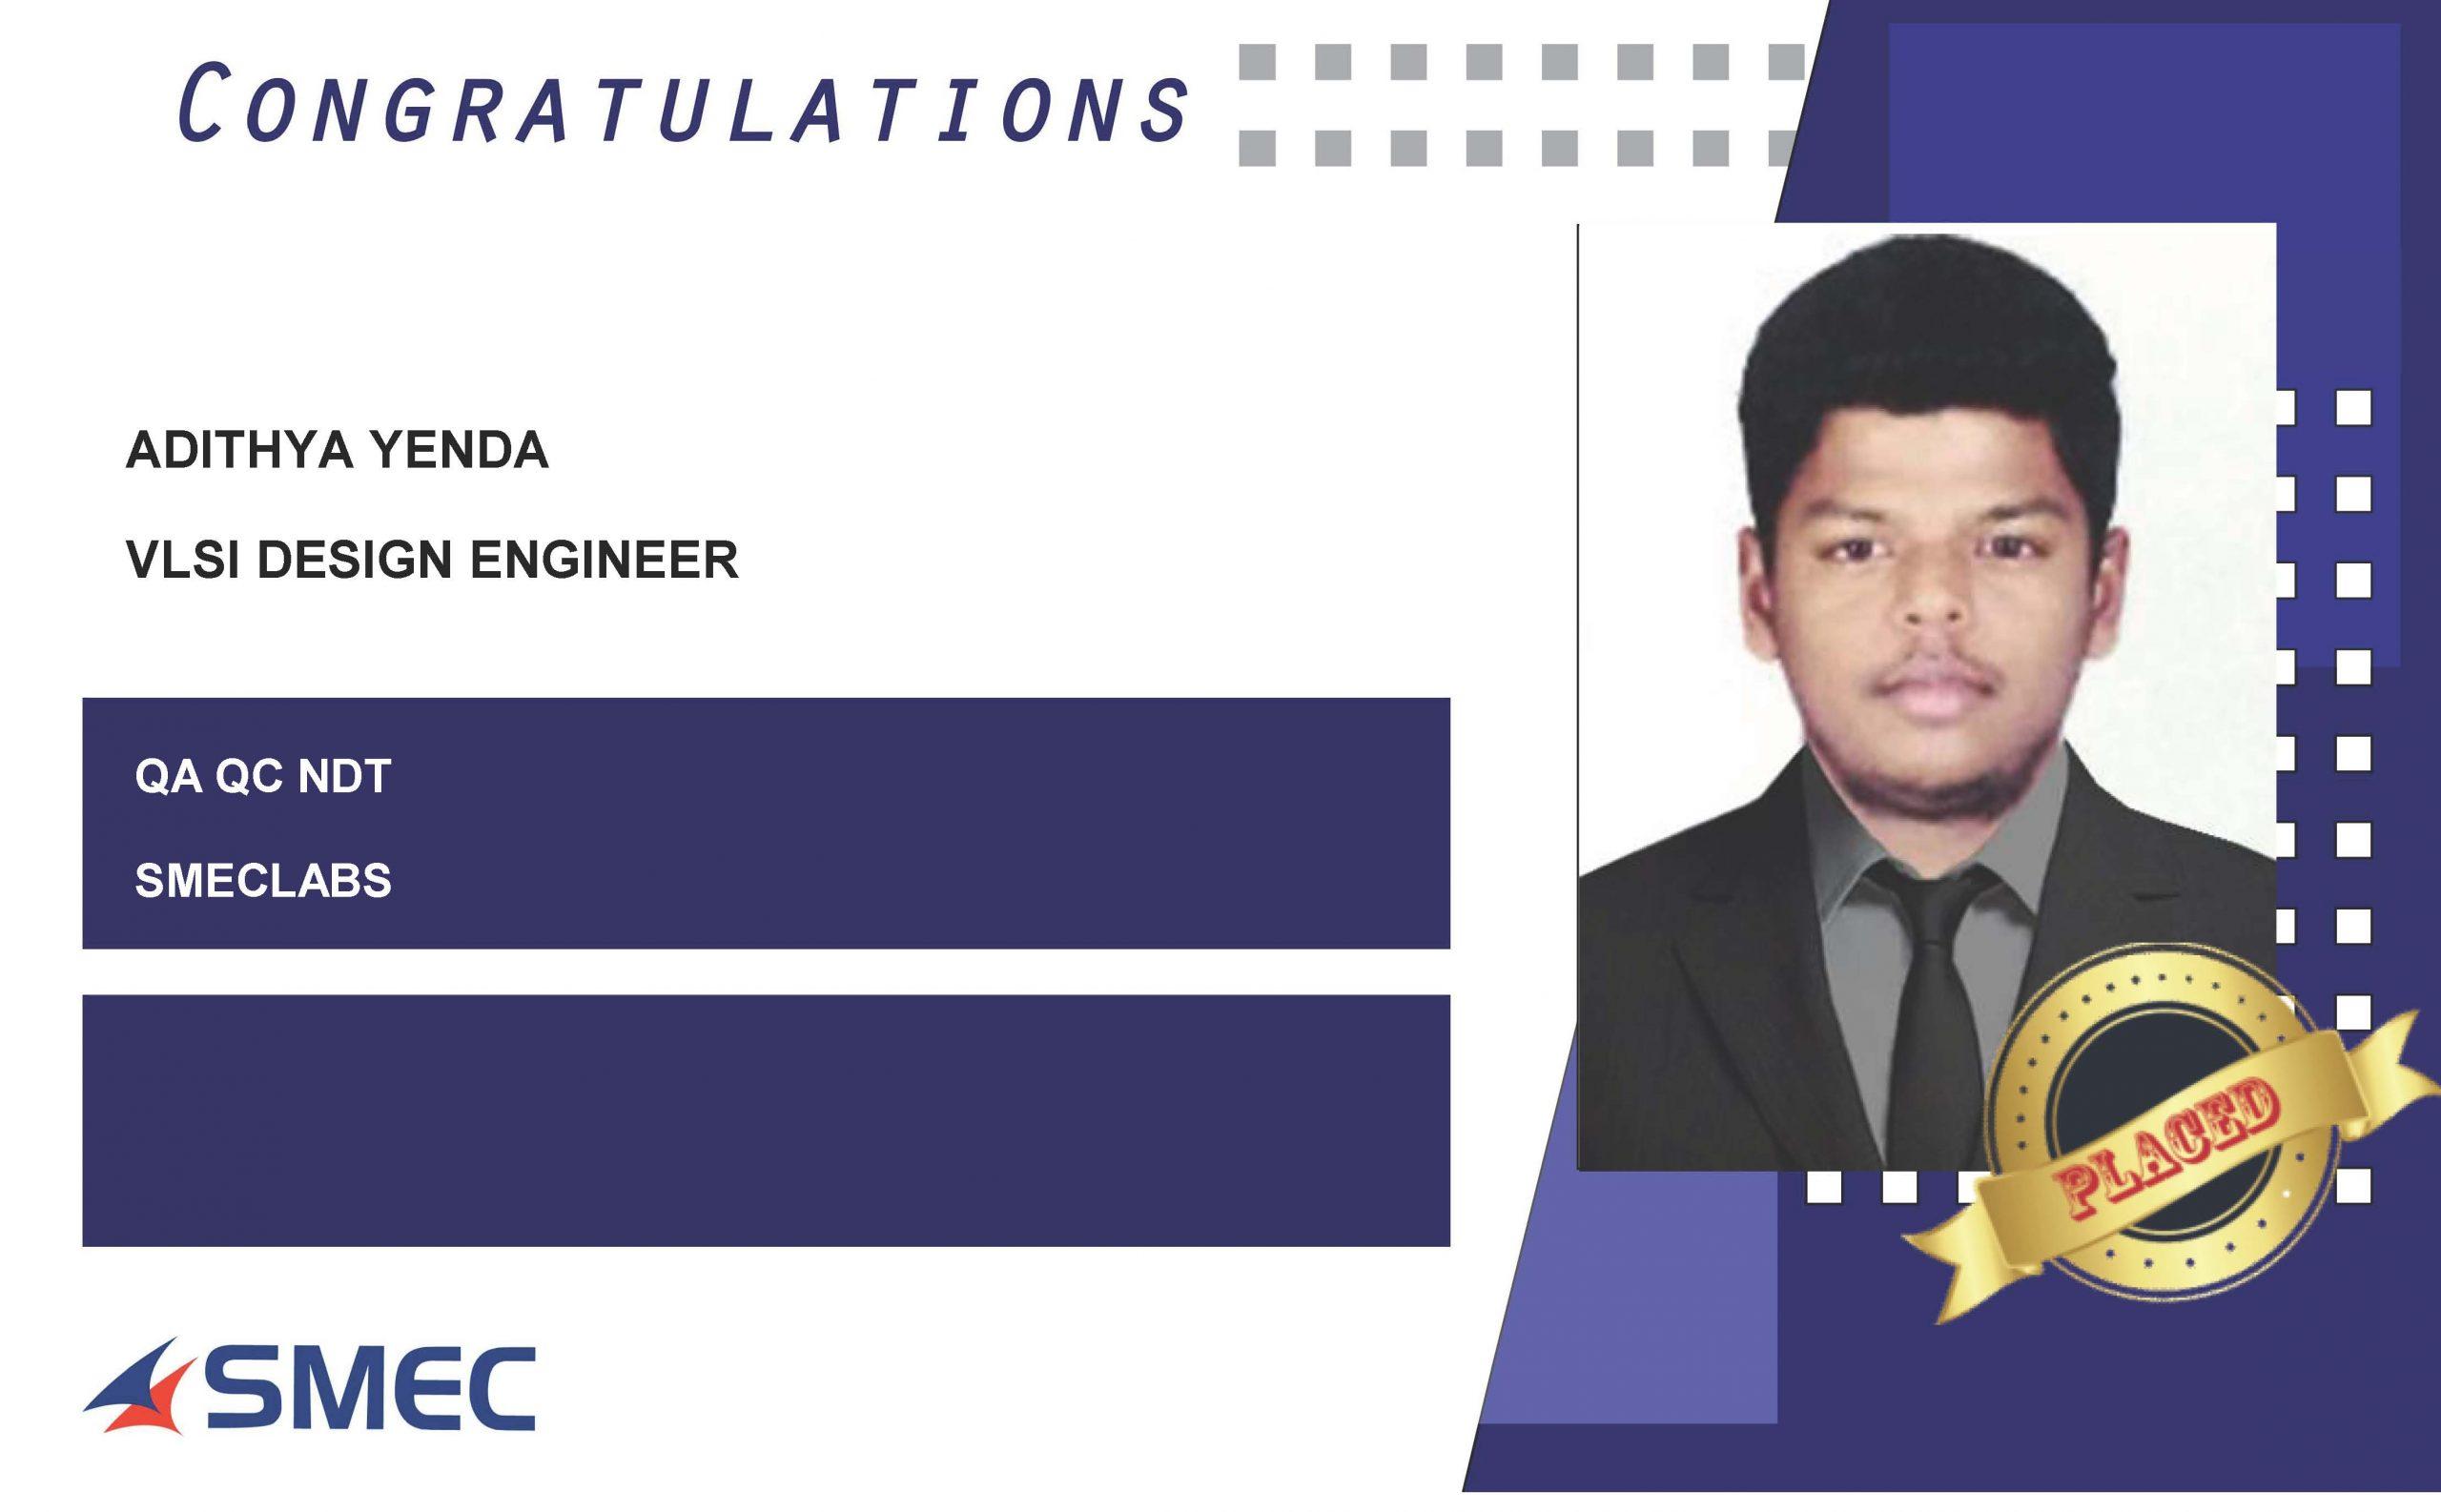 vlsi design engineer - Aditya yenda